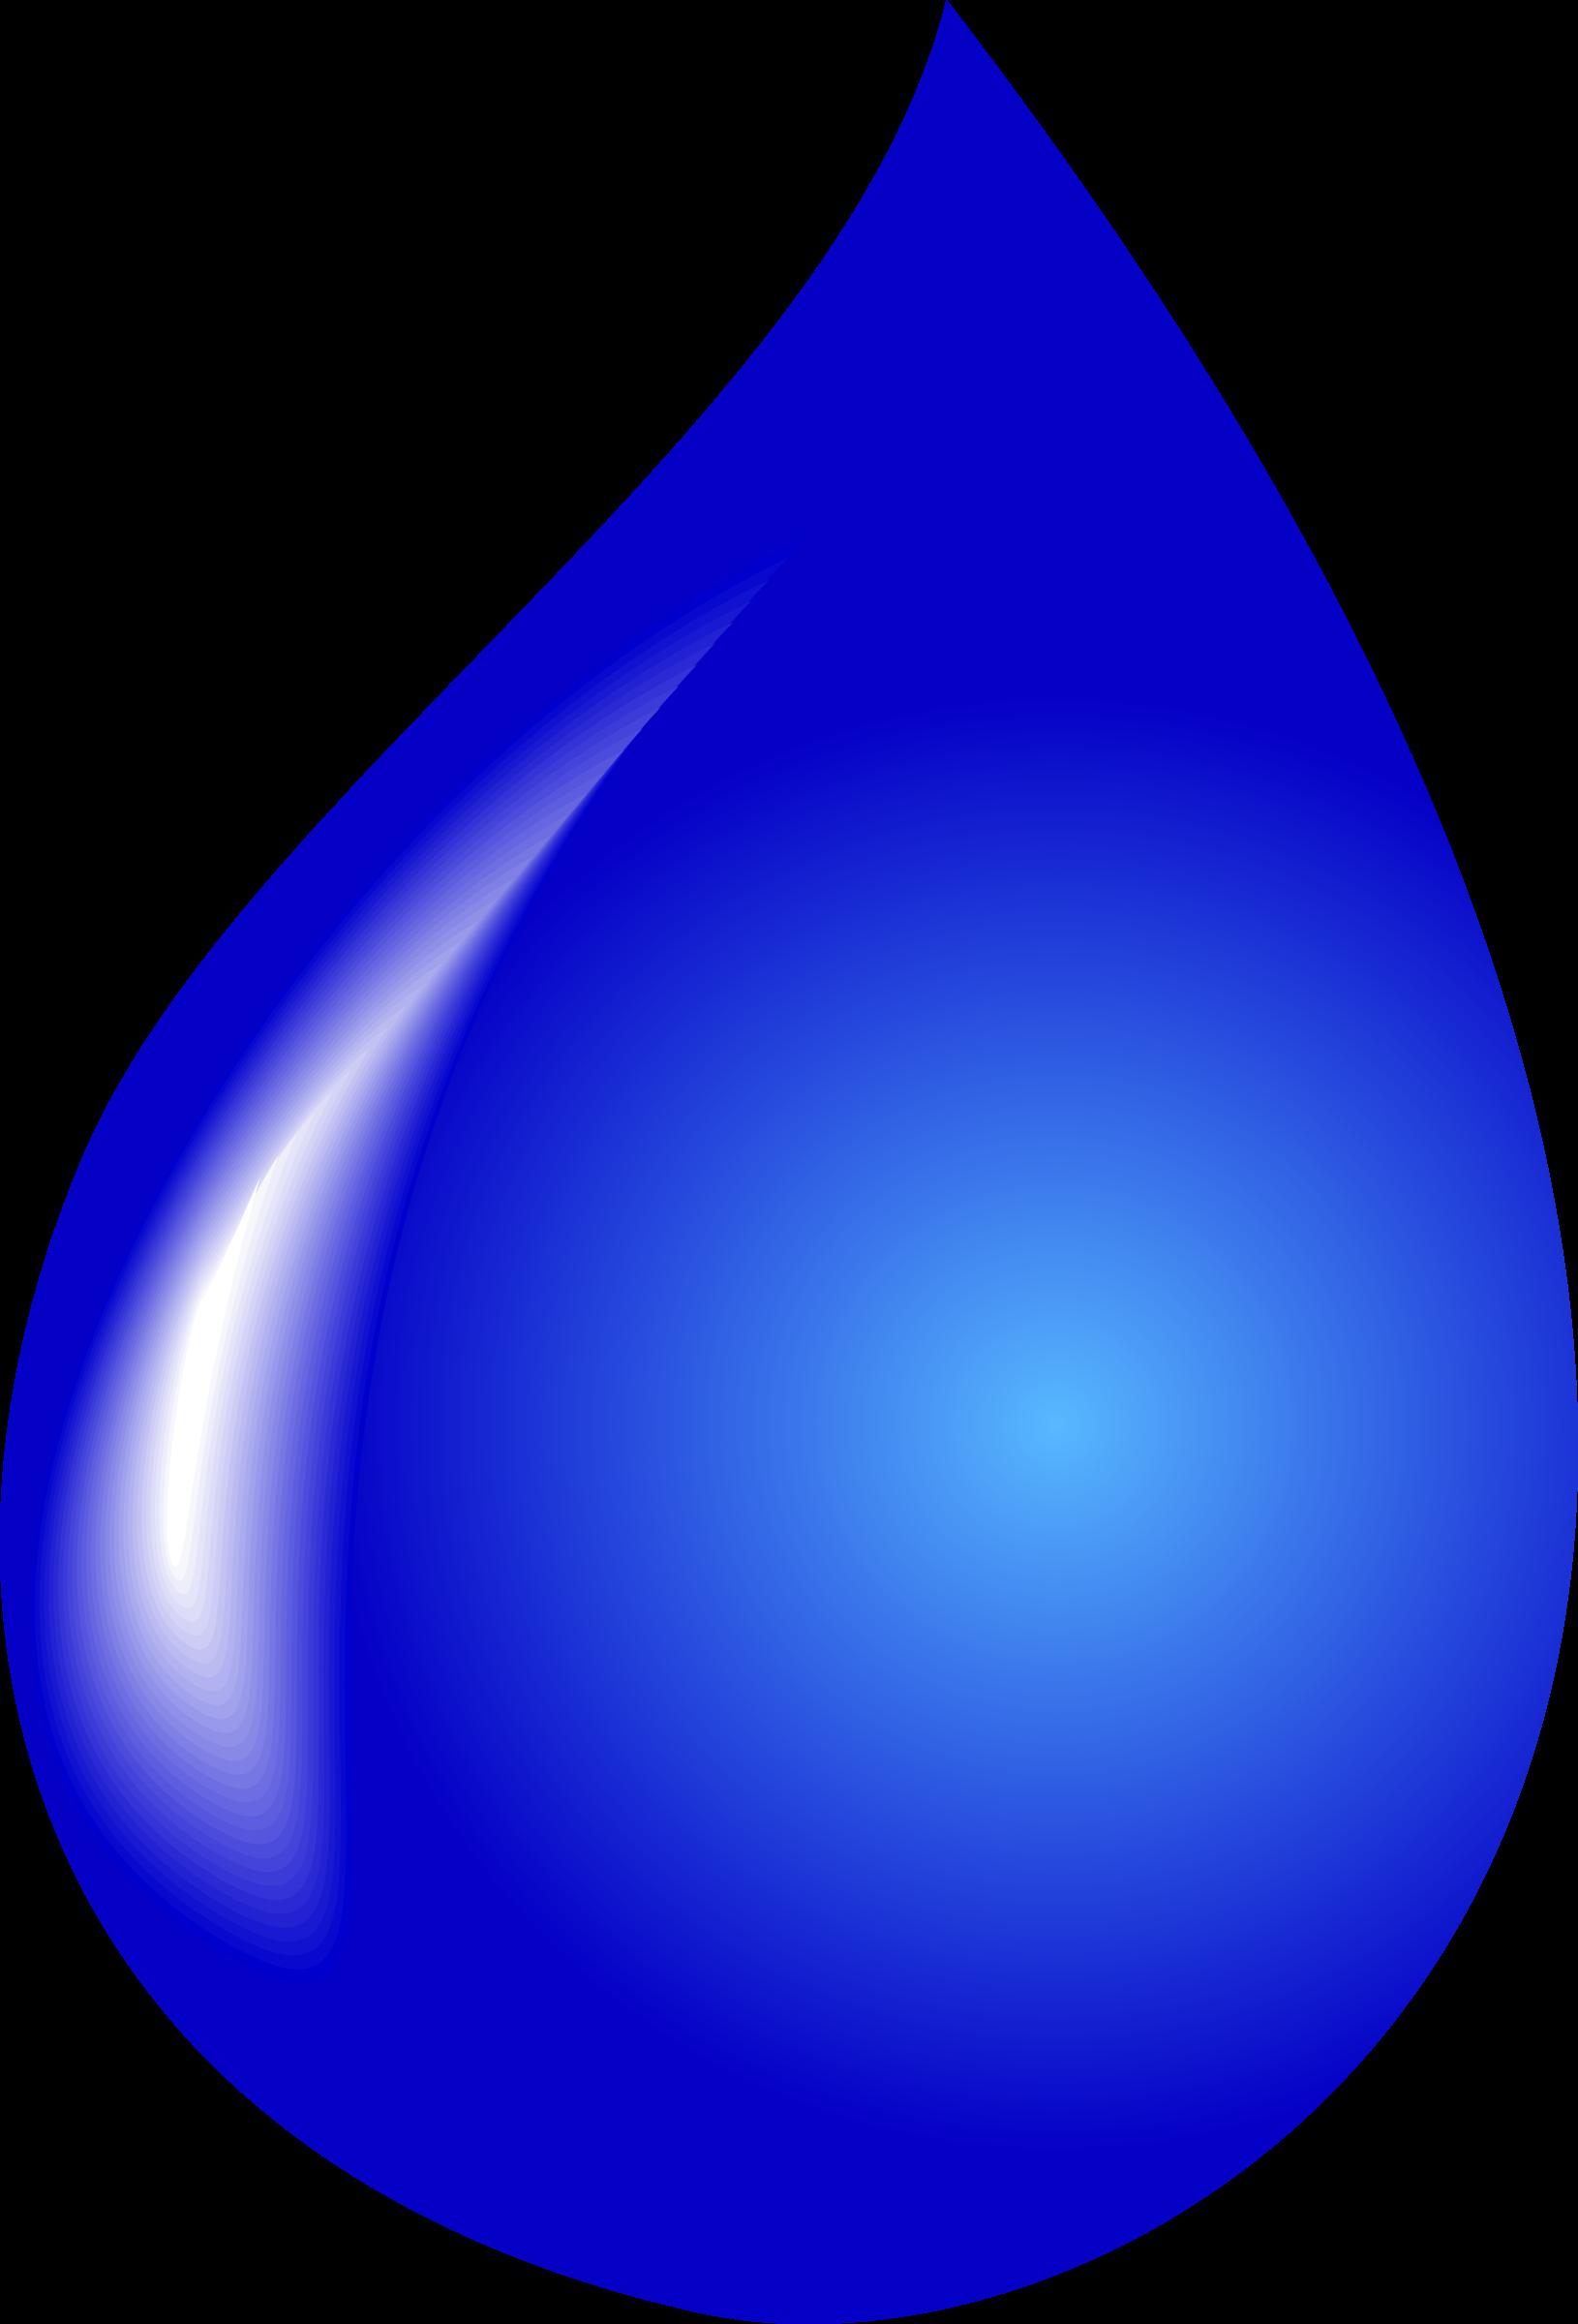 Raindrop clipart tiny. Water drop big image